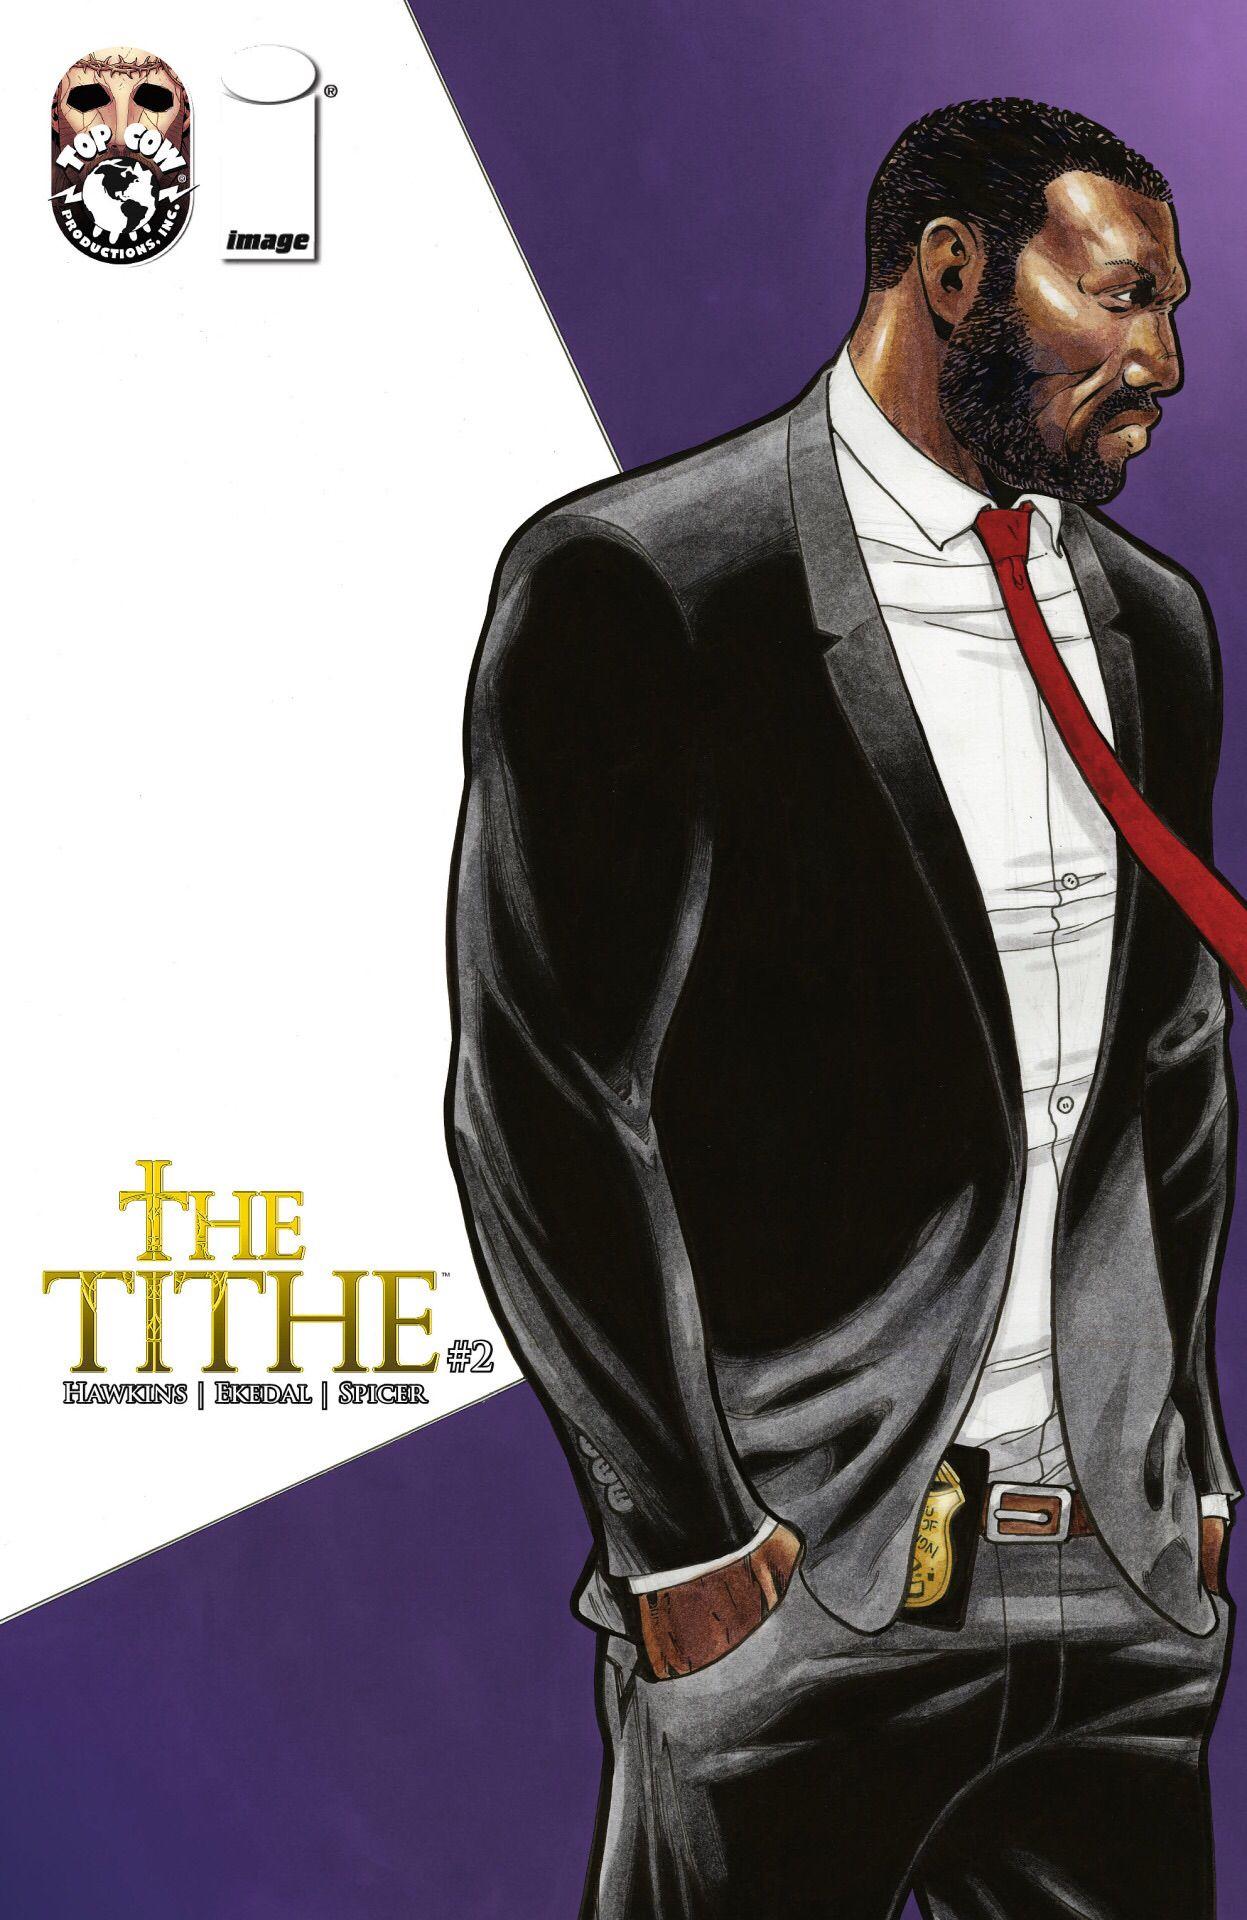 The Tithe #1 free here: http://topcow.com/files/TI001_loreader.pdf